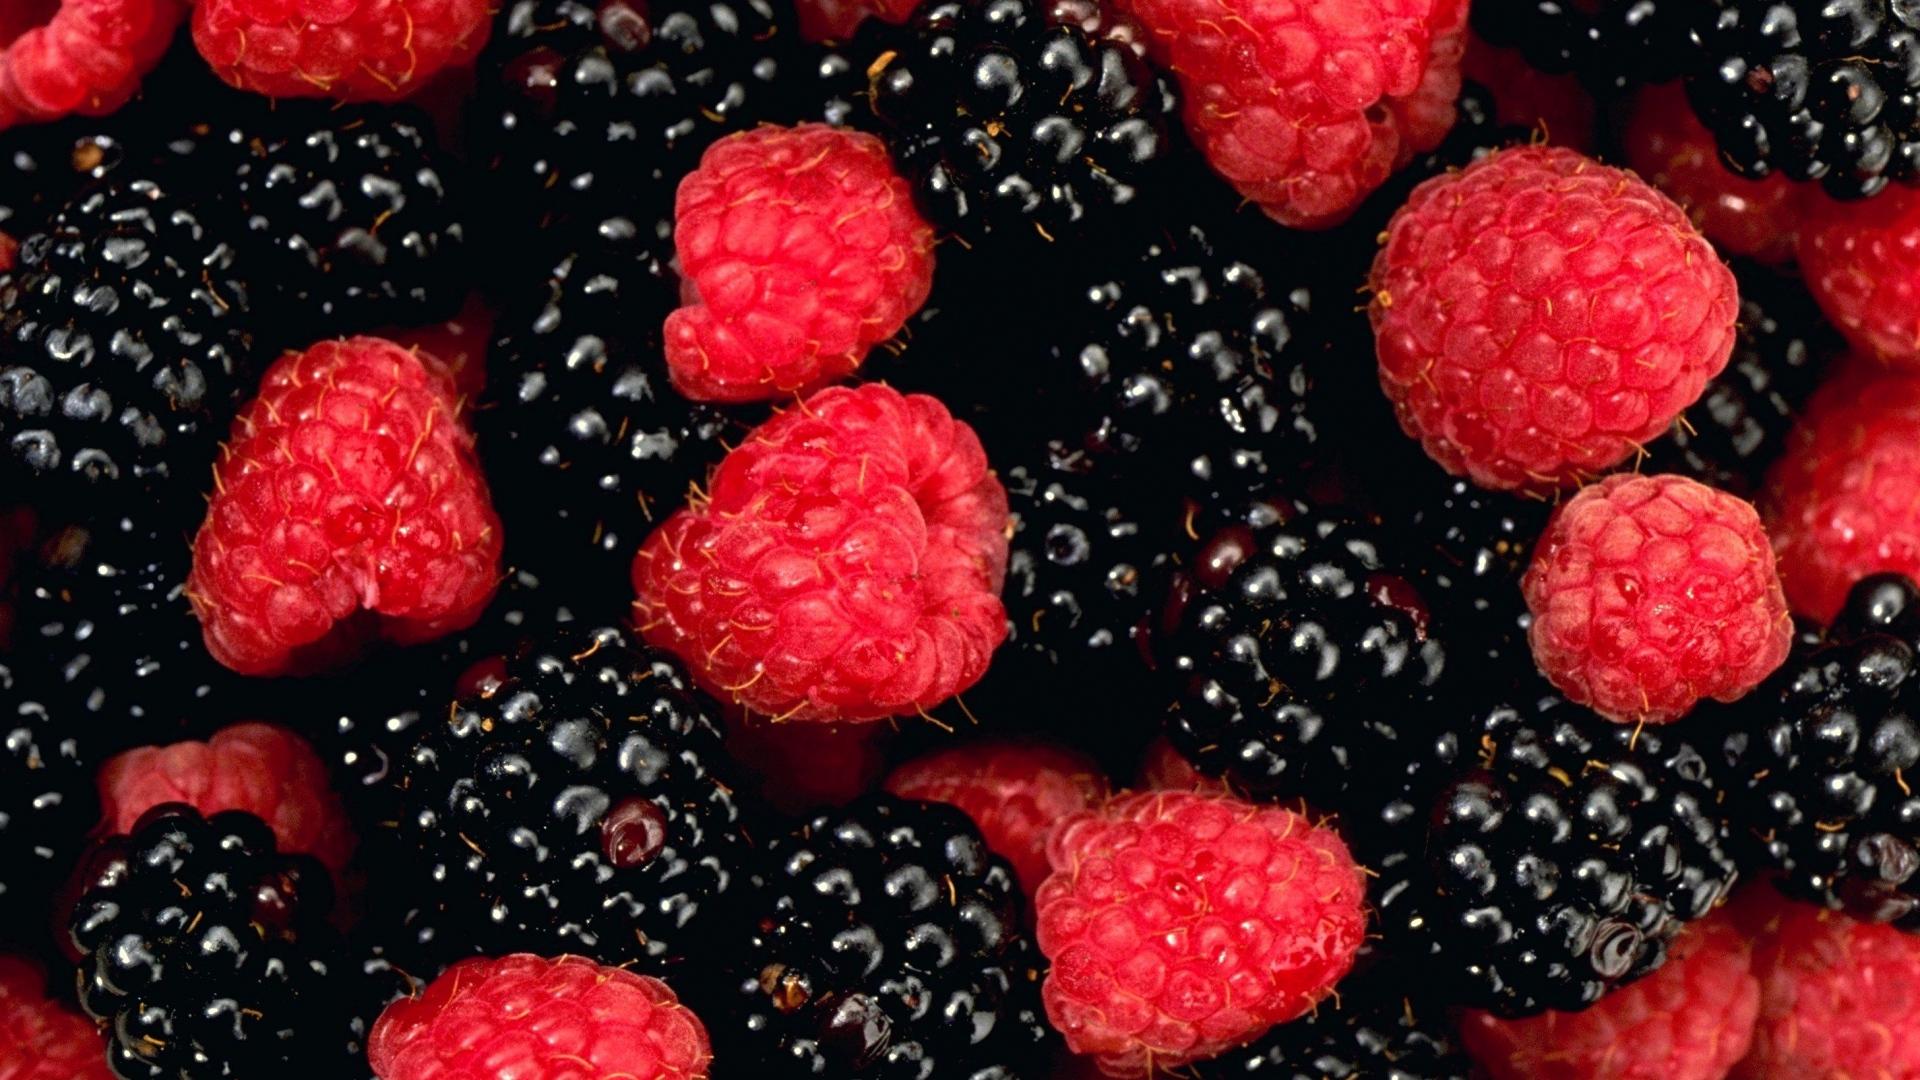 Download Wallpaper 1920x1080 Berry Raspberry Blackberry Allsorts Red Blac Full Hd 1080p Hd Background